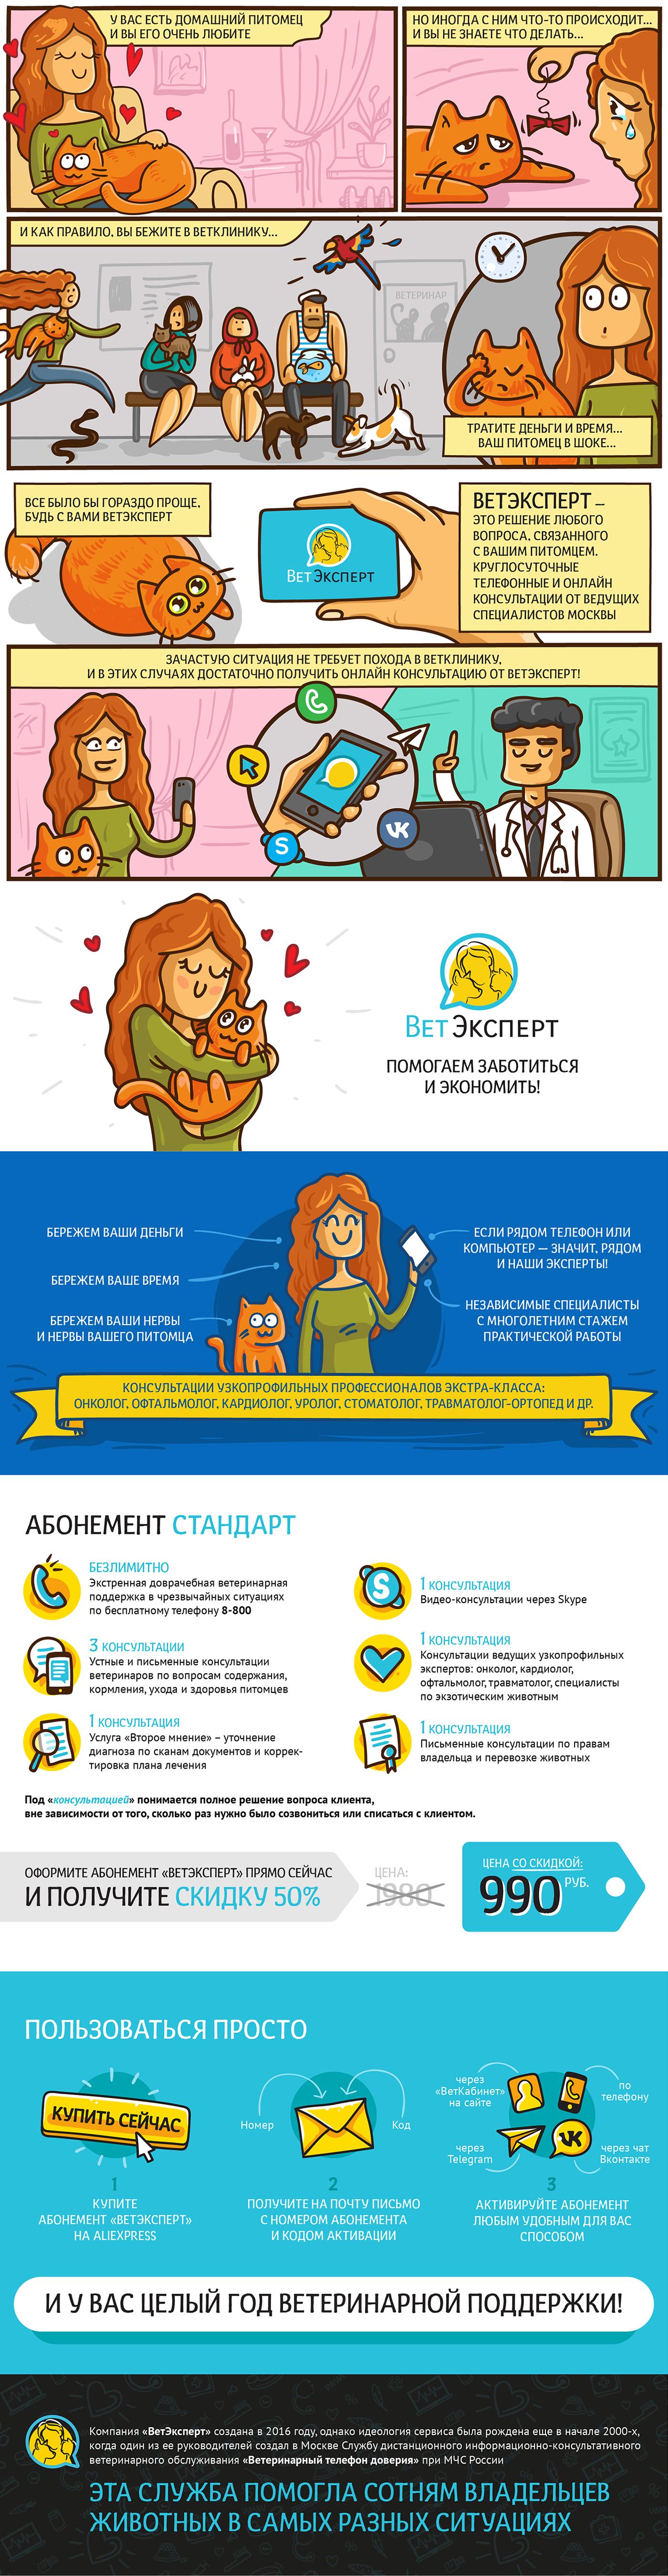 strip comic infographic Visual Marketing инфографика комикс